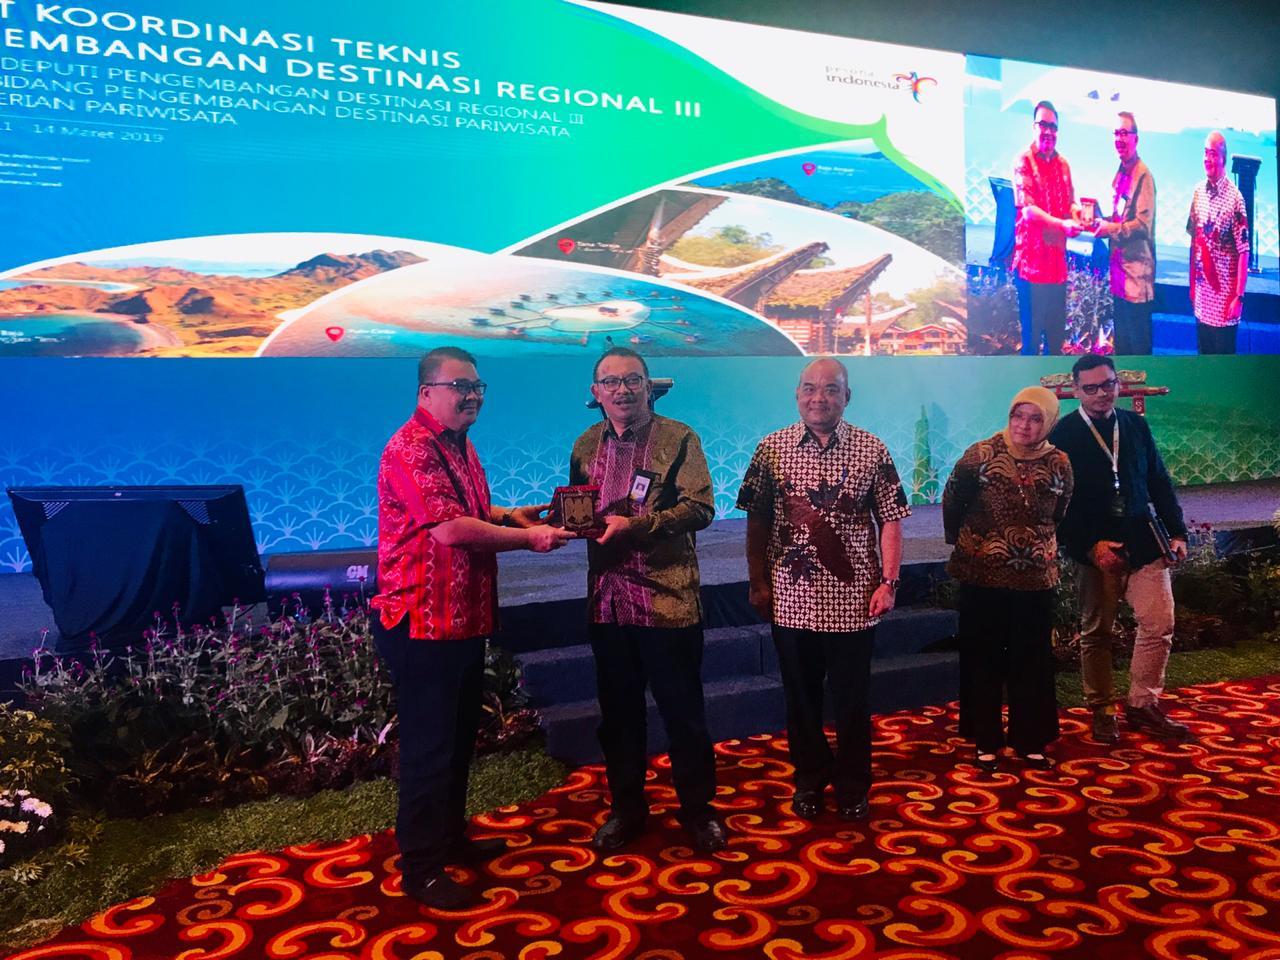 Hadiri Rakortek Pariwisata, Tumondo Serahkan Plaket Manguni Buat Wagub Yogyakarta